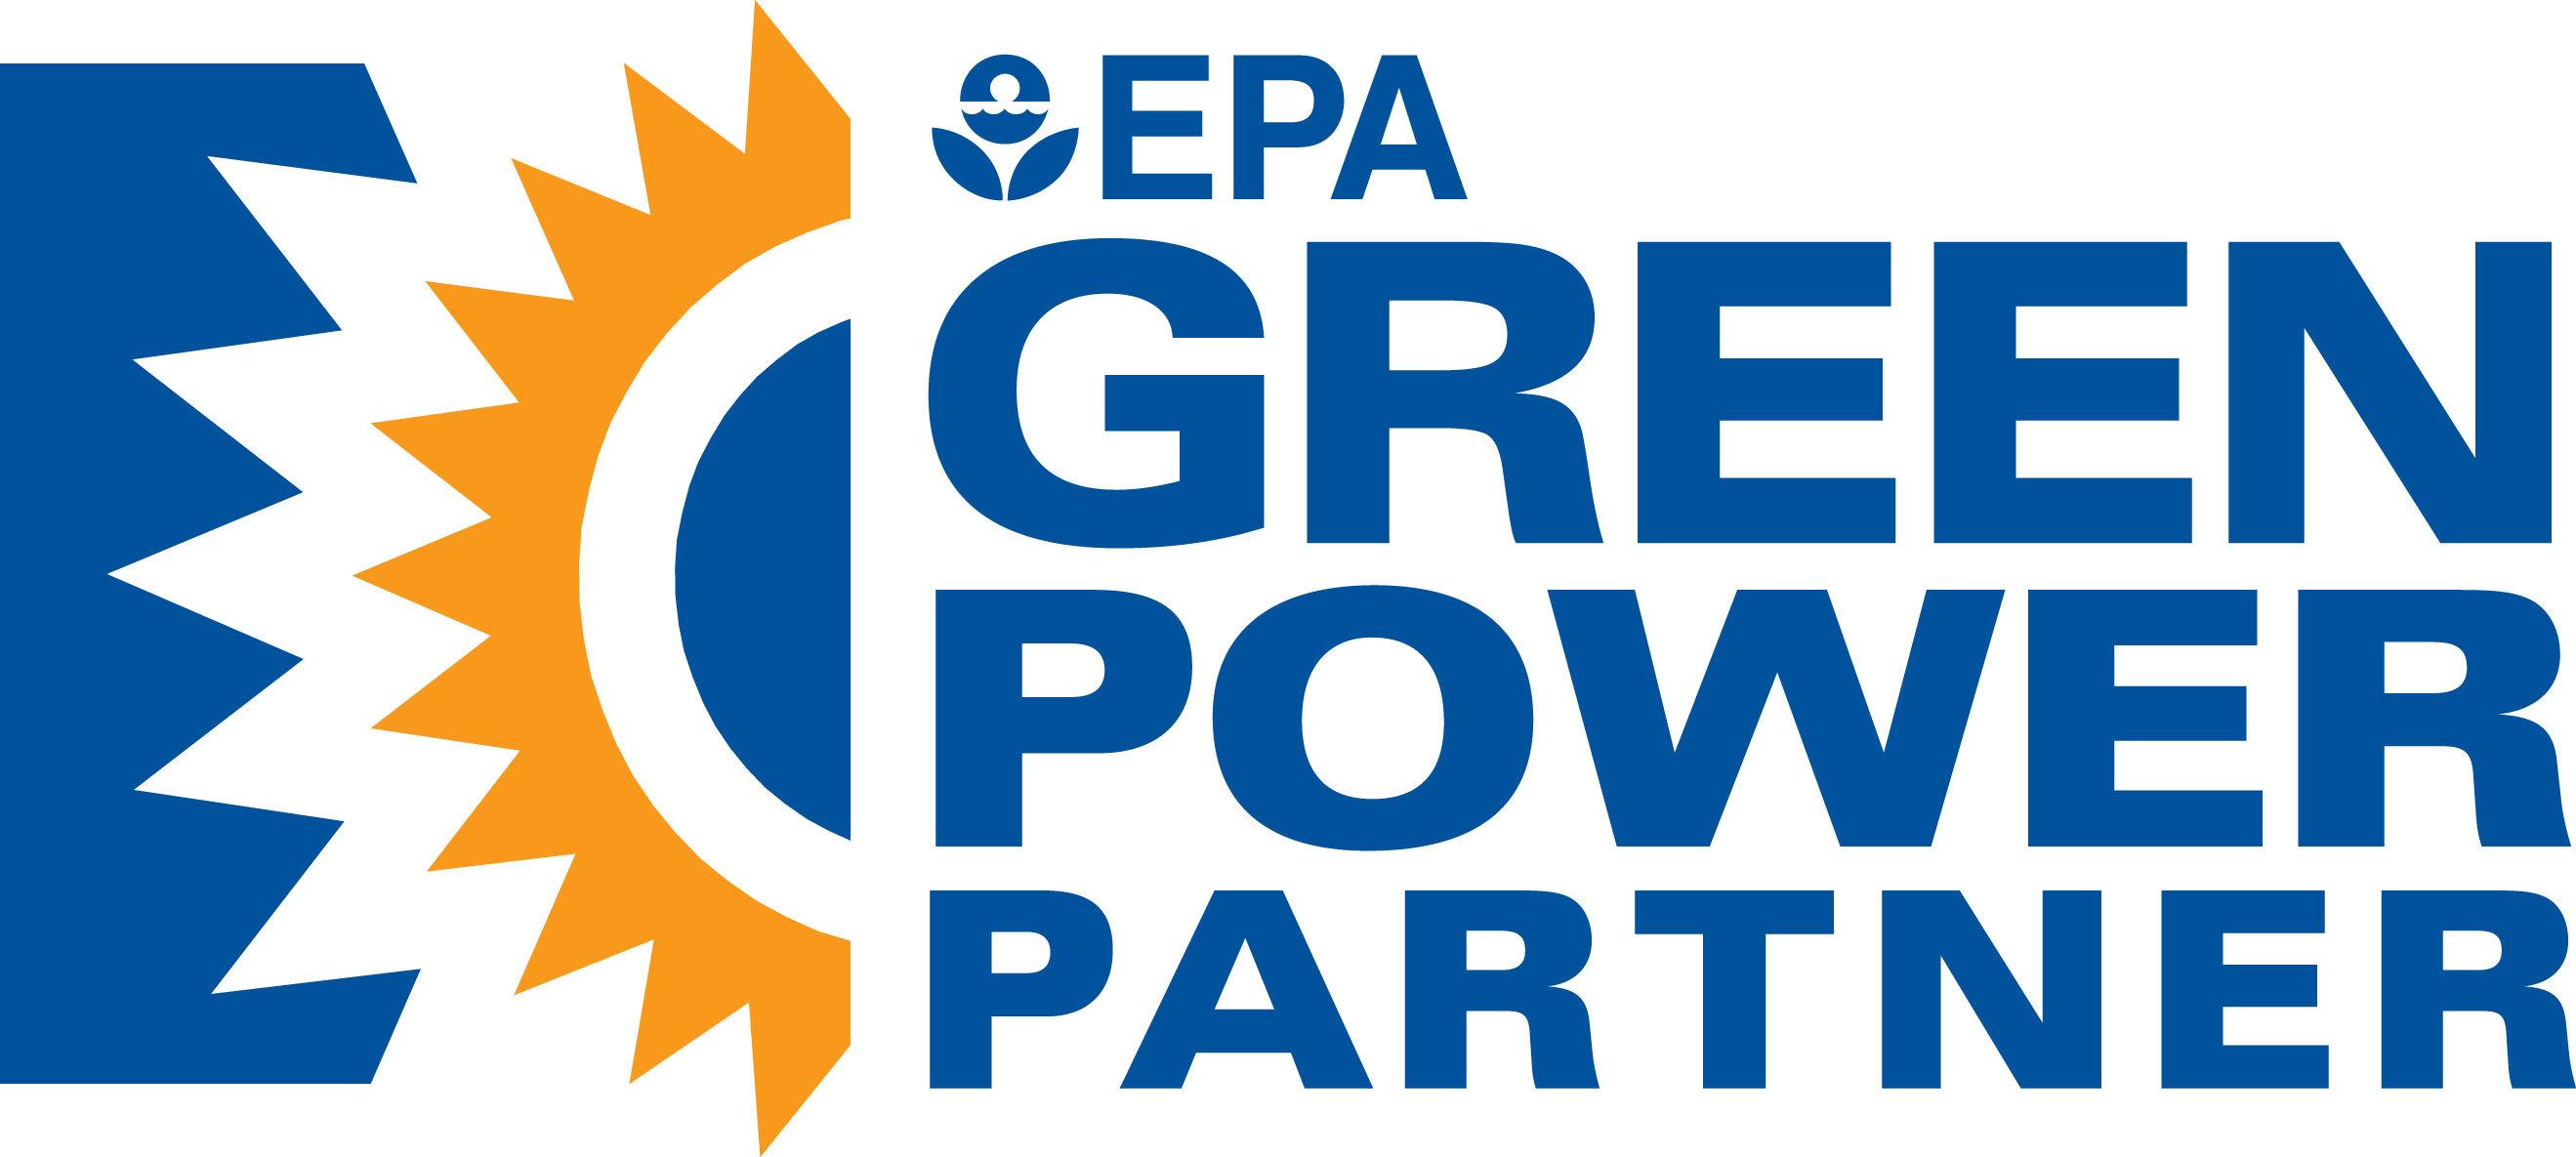 EPA green power partner providing green data center services